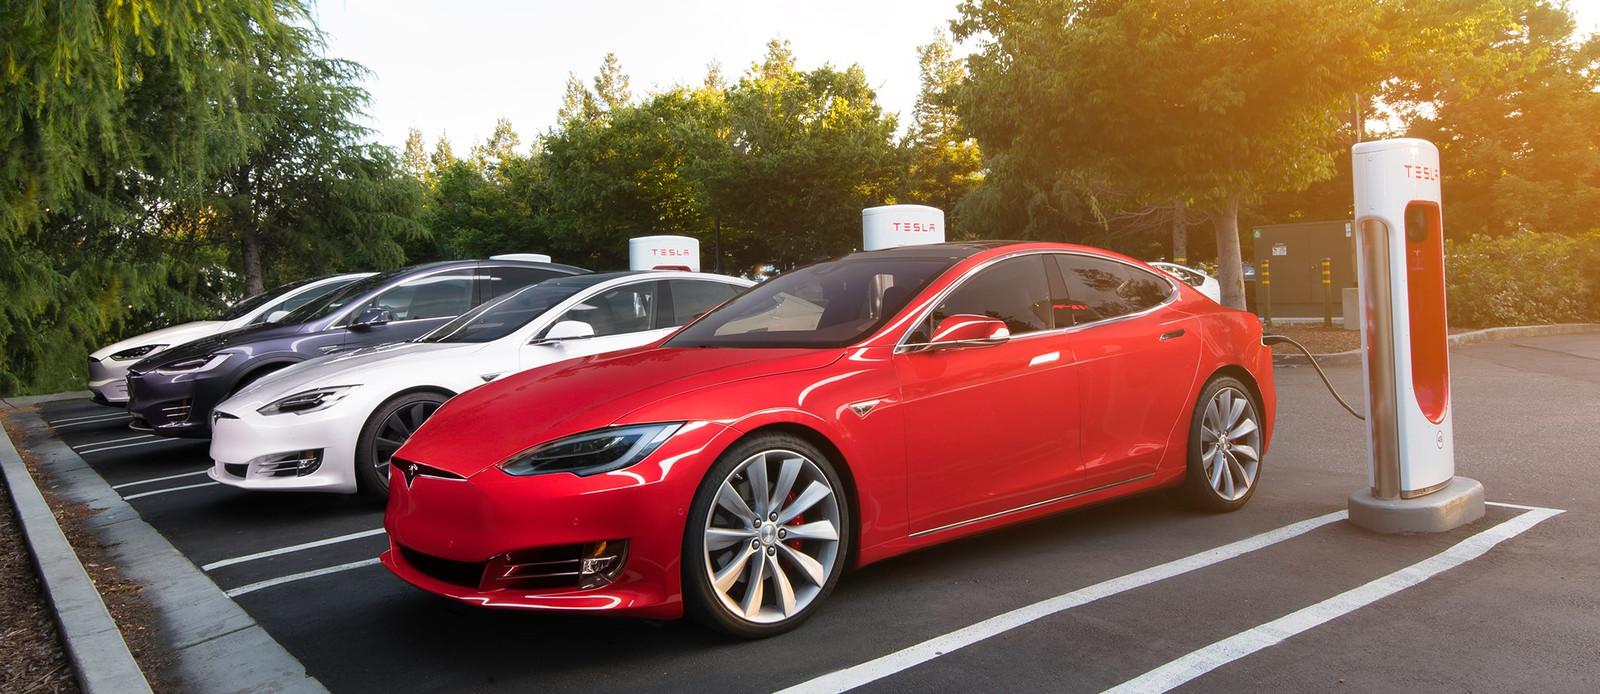 De Tesla Model S Long Range haalt nu al zo'n 600 kilometer op één batterijlading